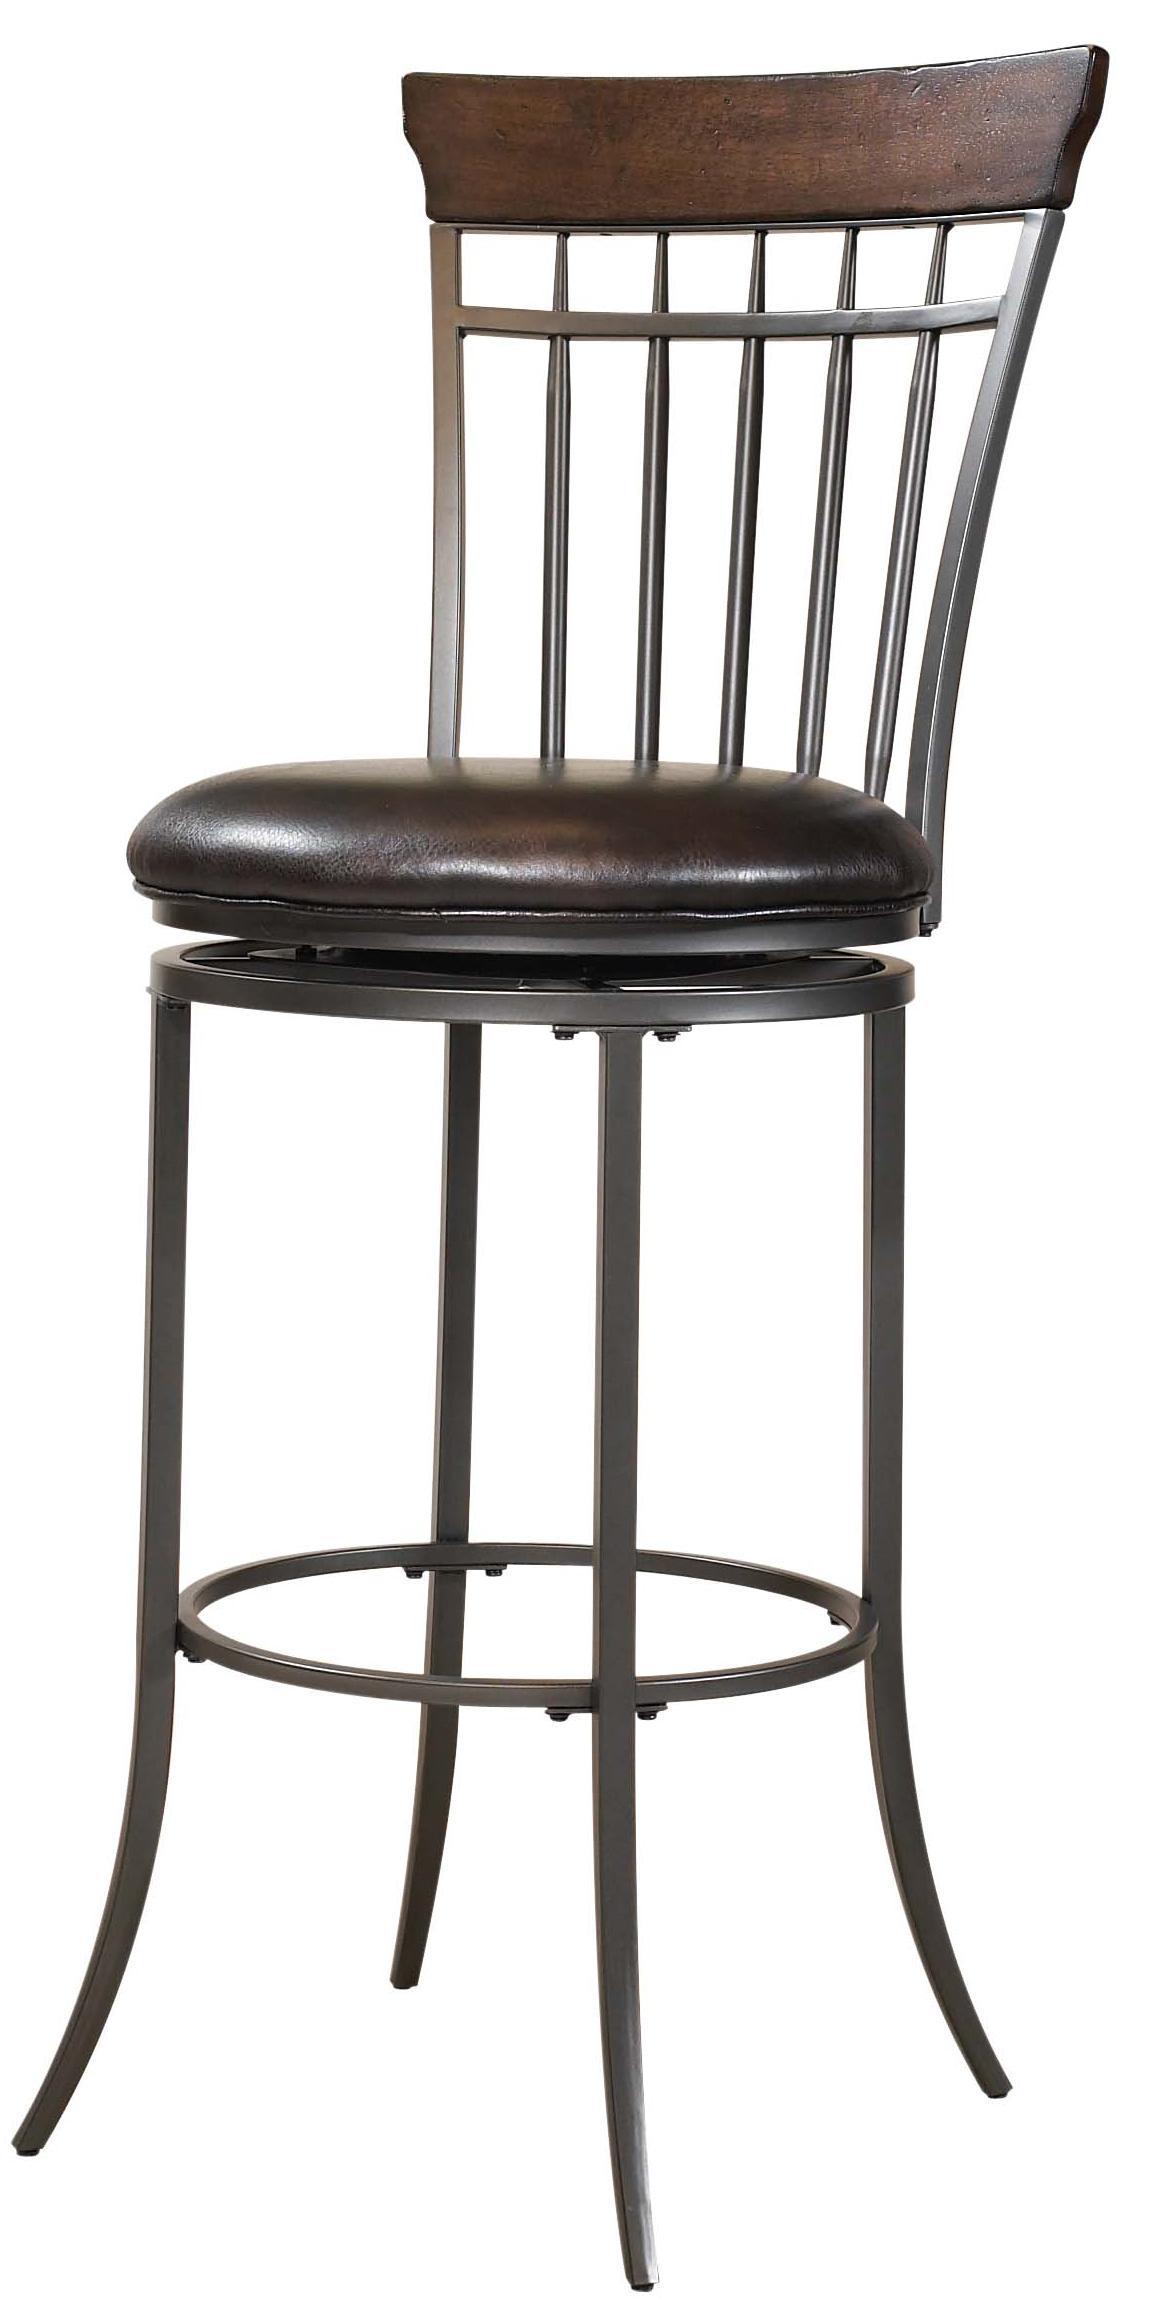 hillsdale metal stools cameron swivel vertical spindle back counter stool johnny janosik bar. Black Bedroom Furniture Sets. Home Design Ideas